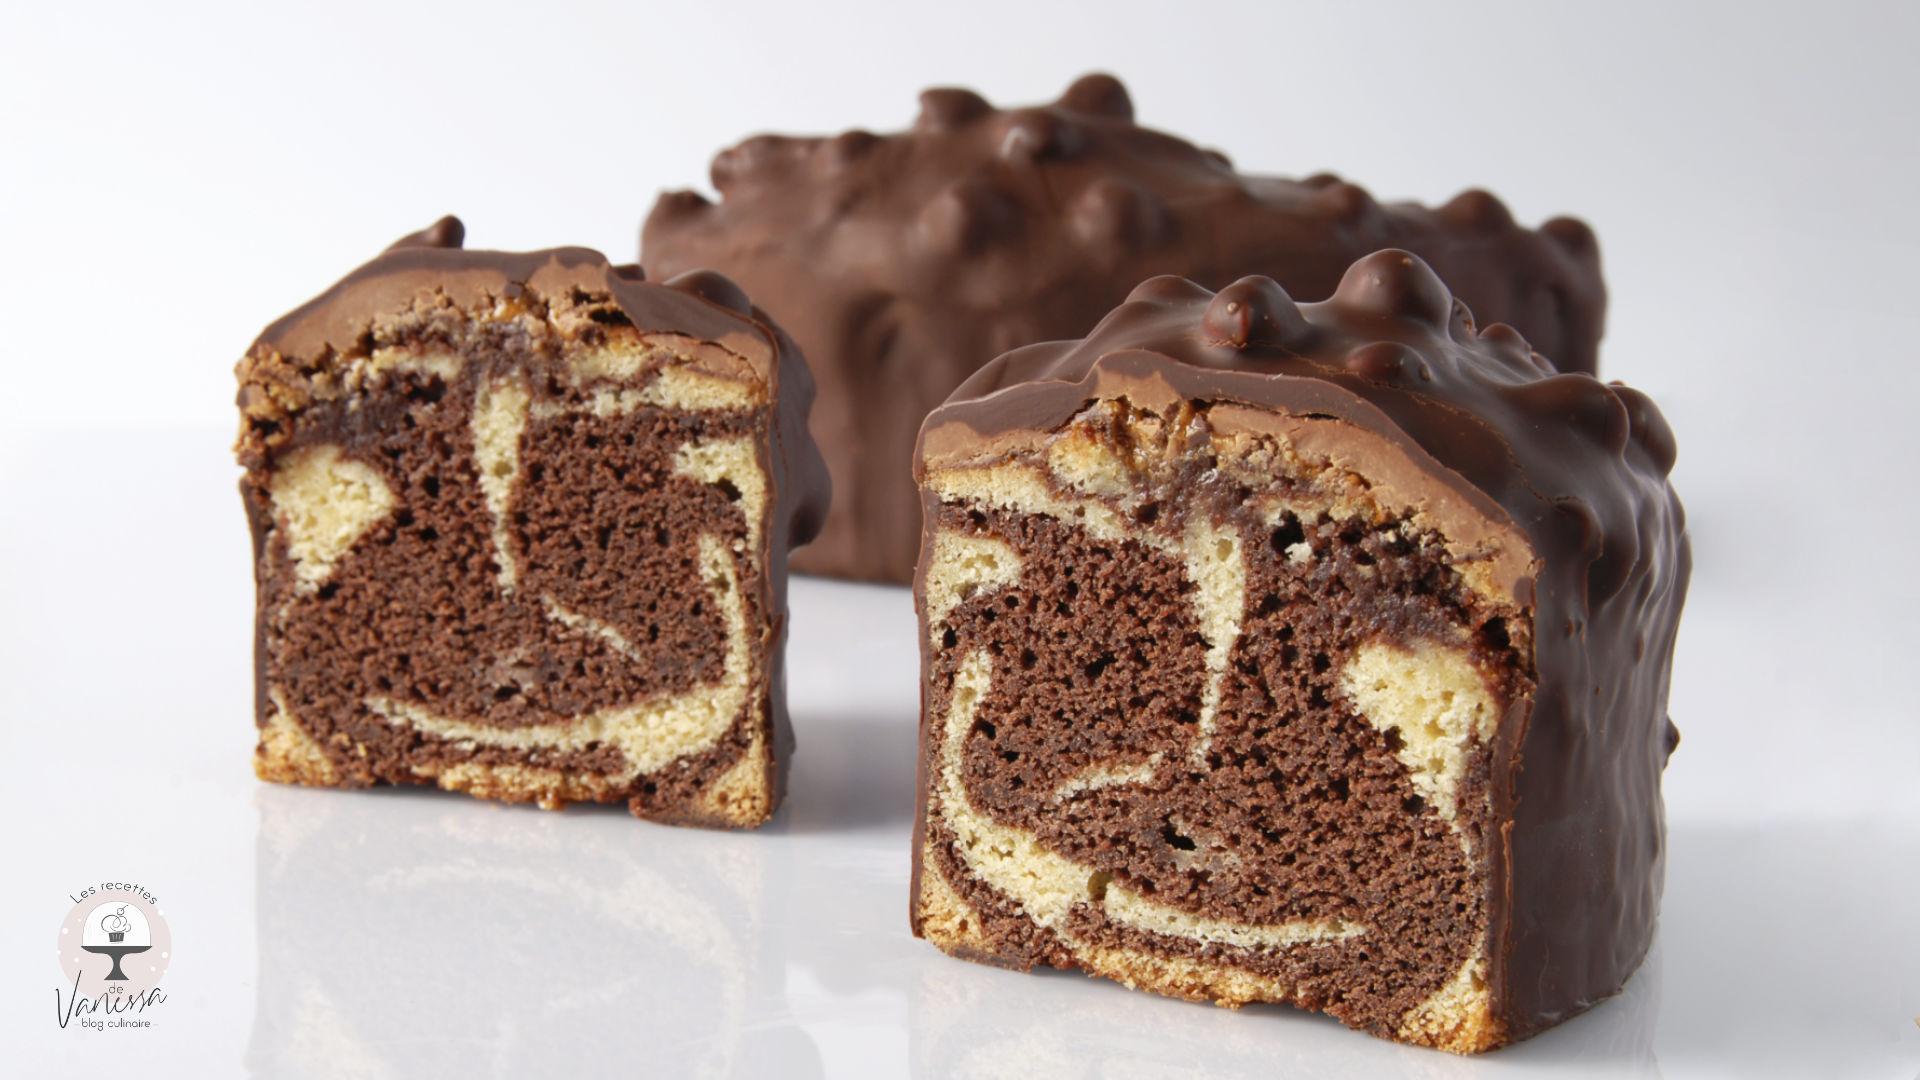 Cake noisettes gianduja